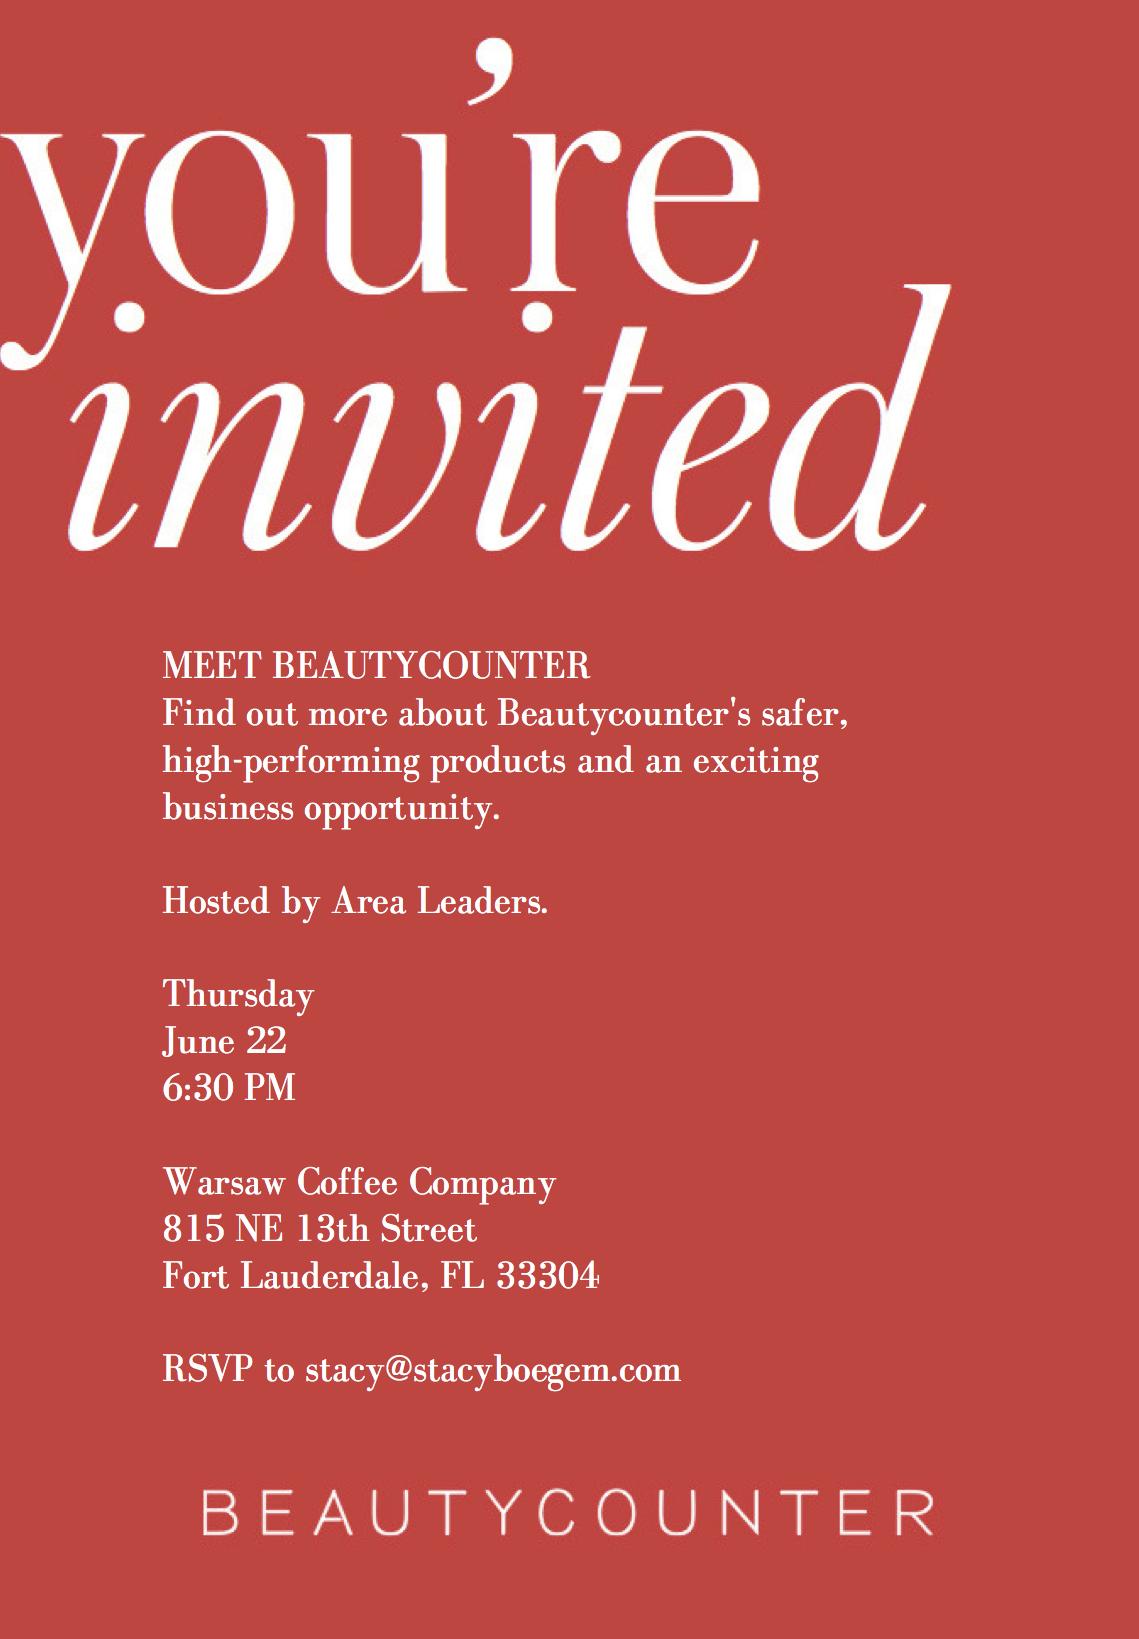 Meet Beautycounter in Fort Lauderdale